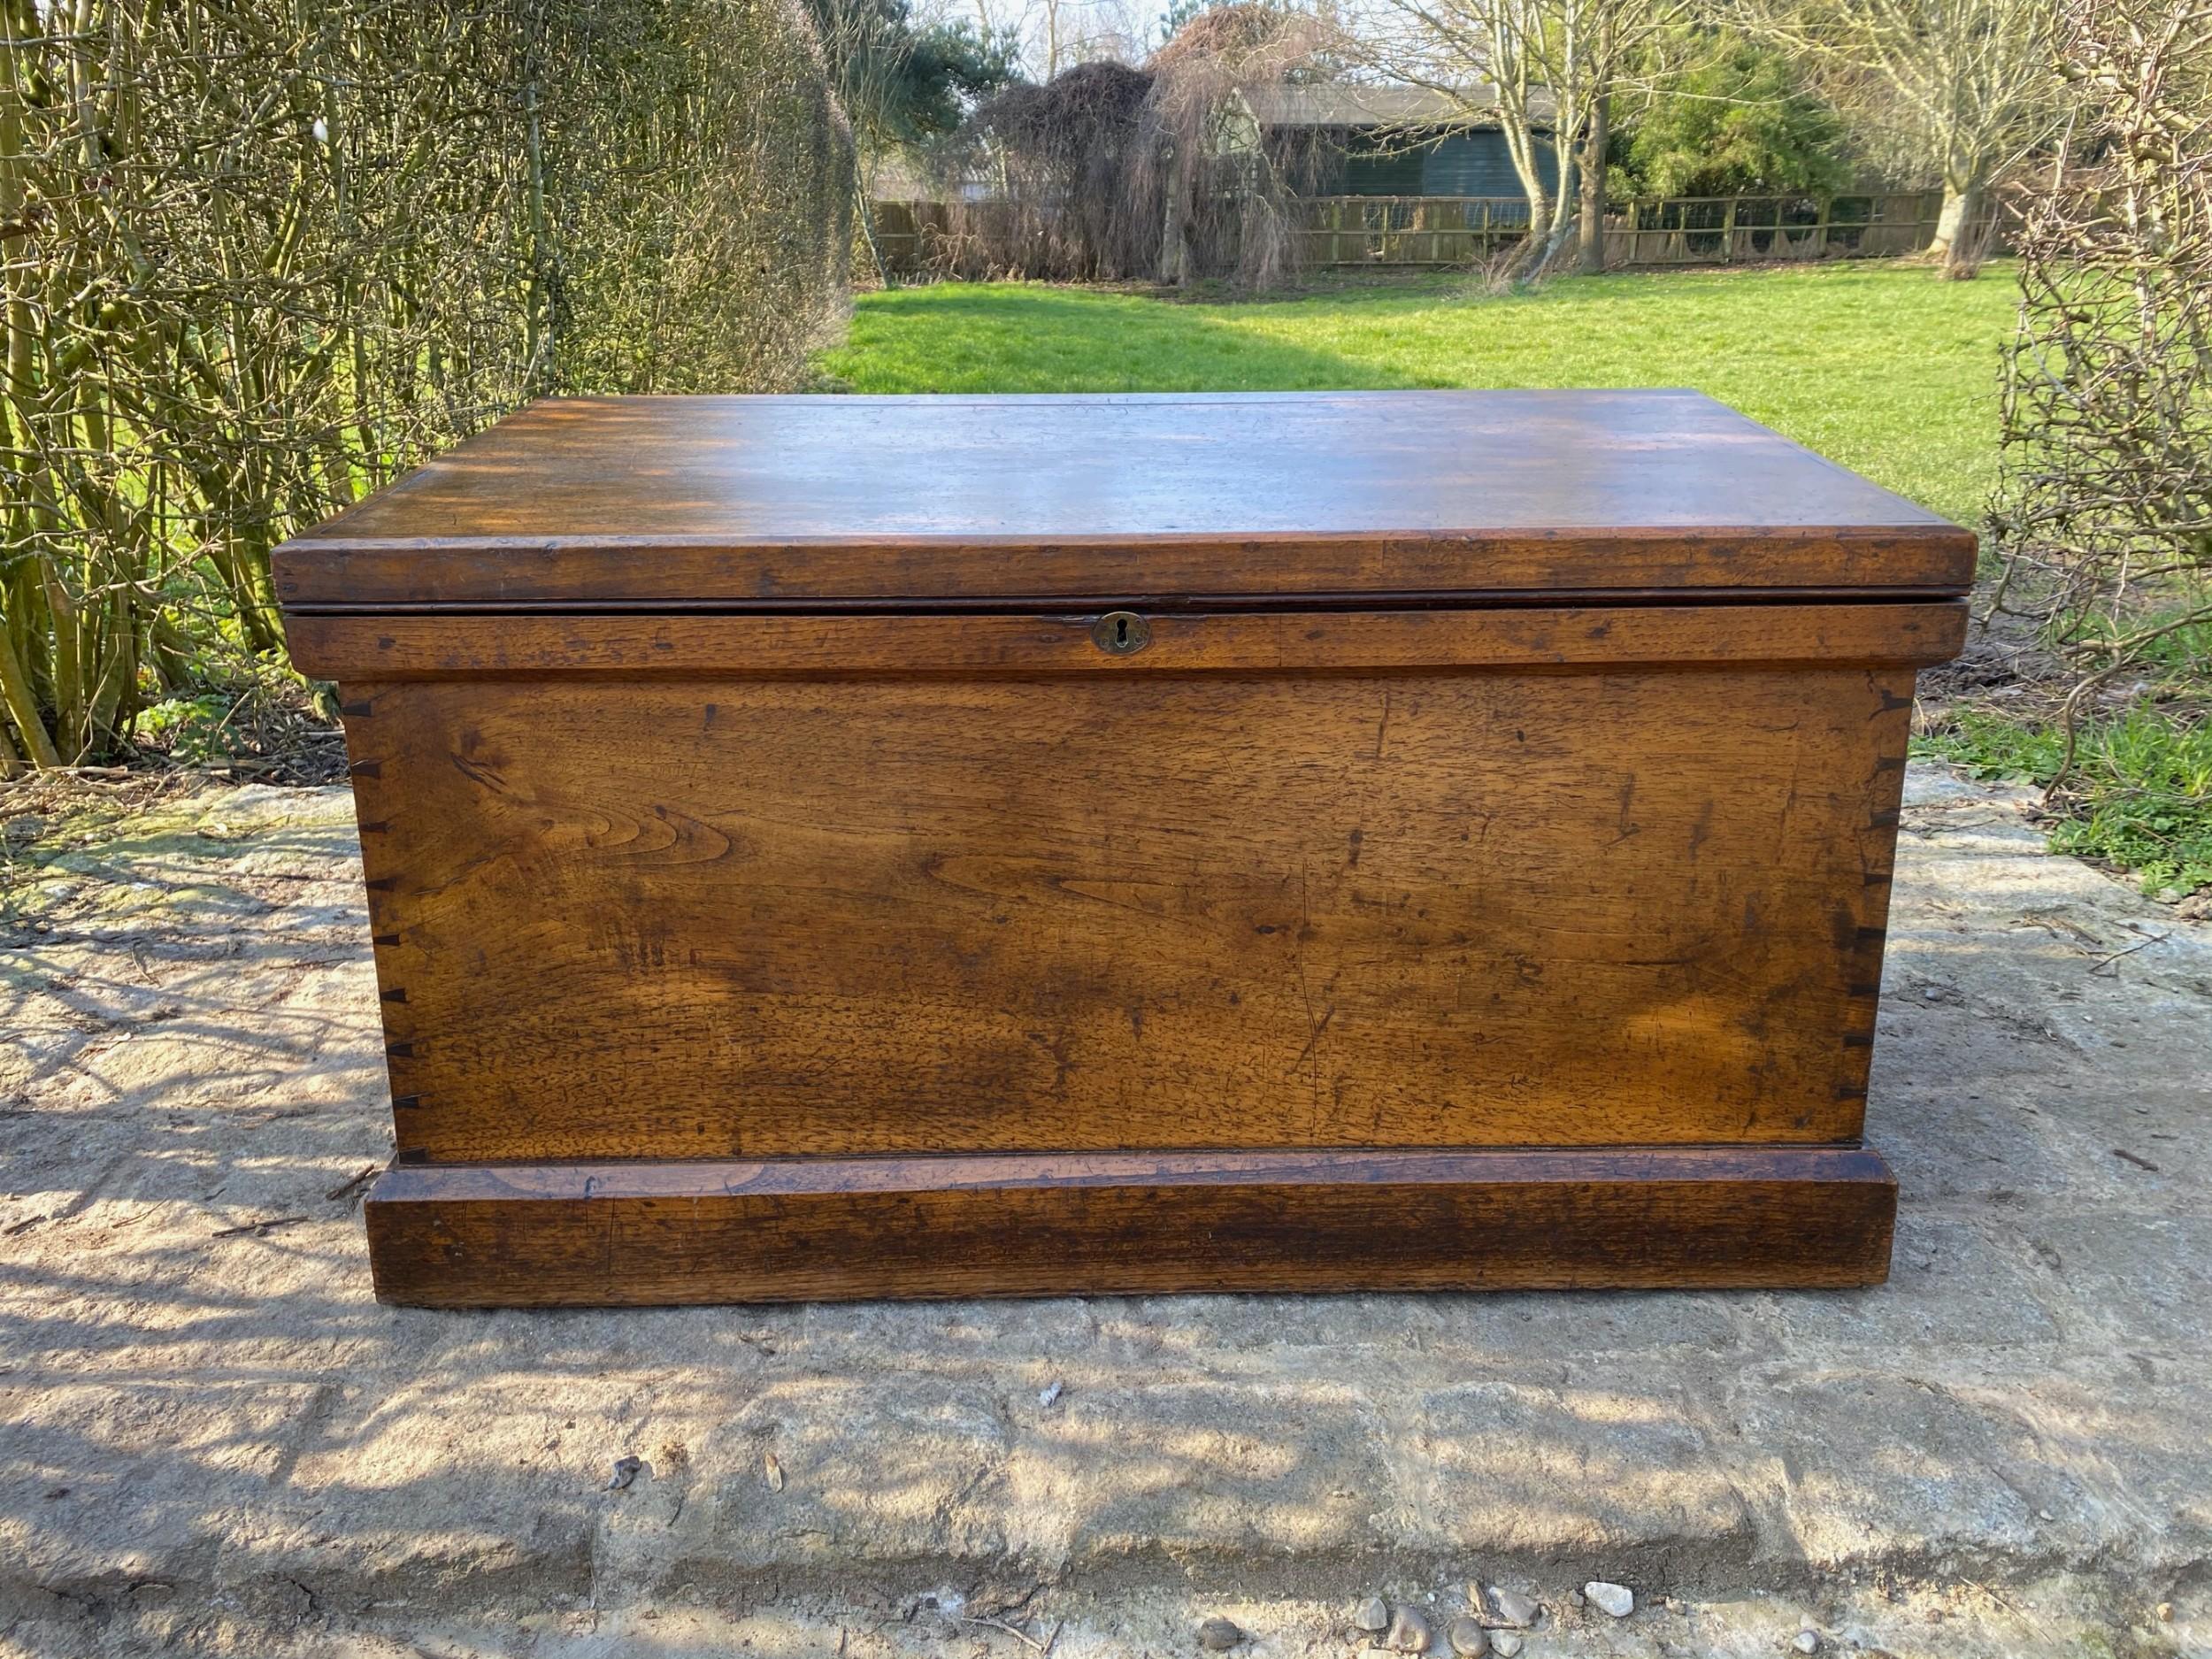 19th century teak seachest trunk